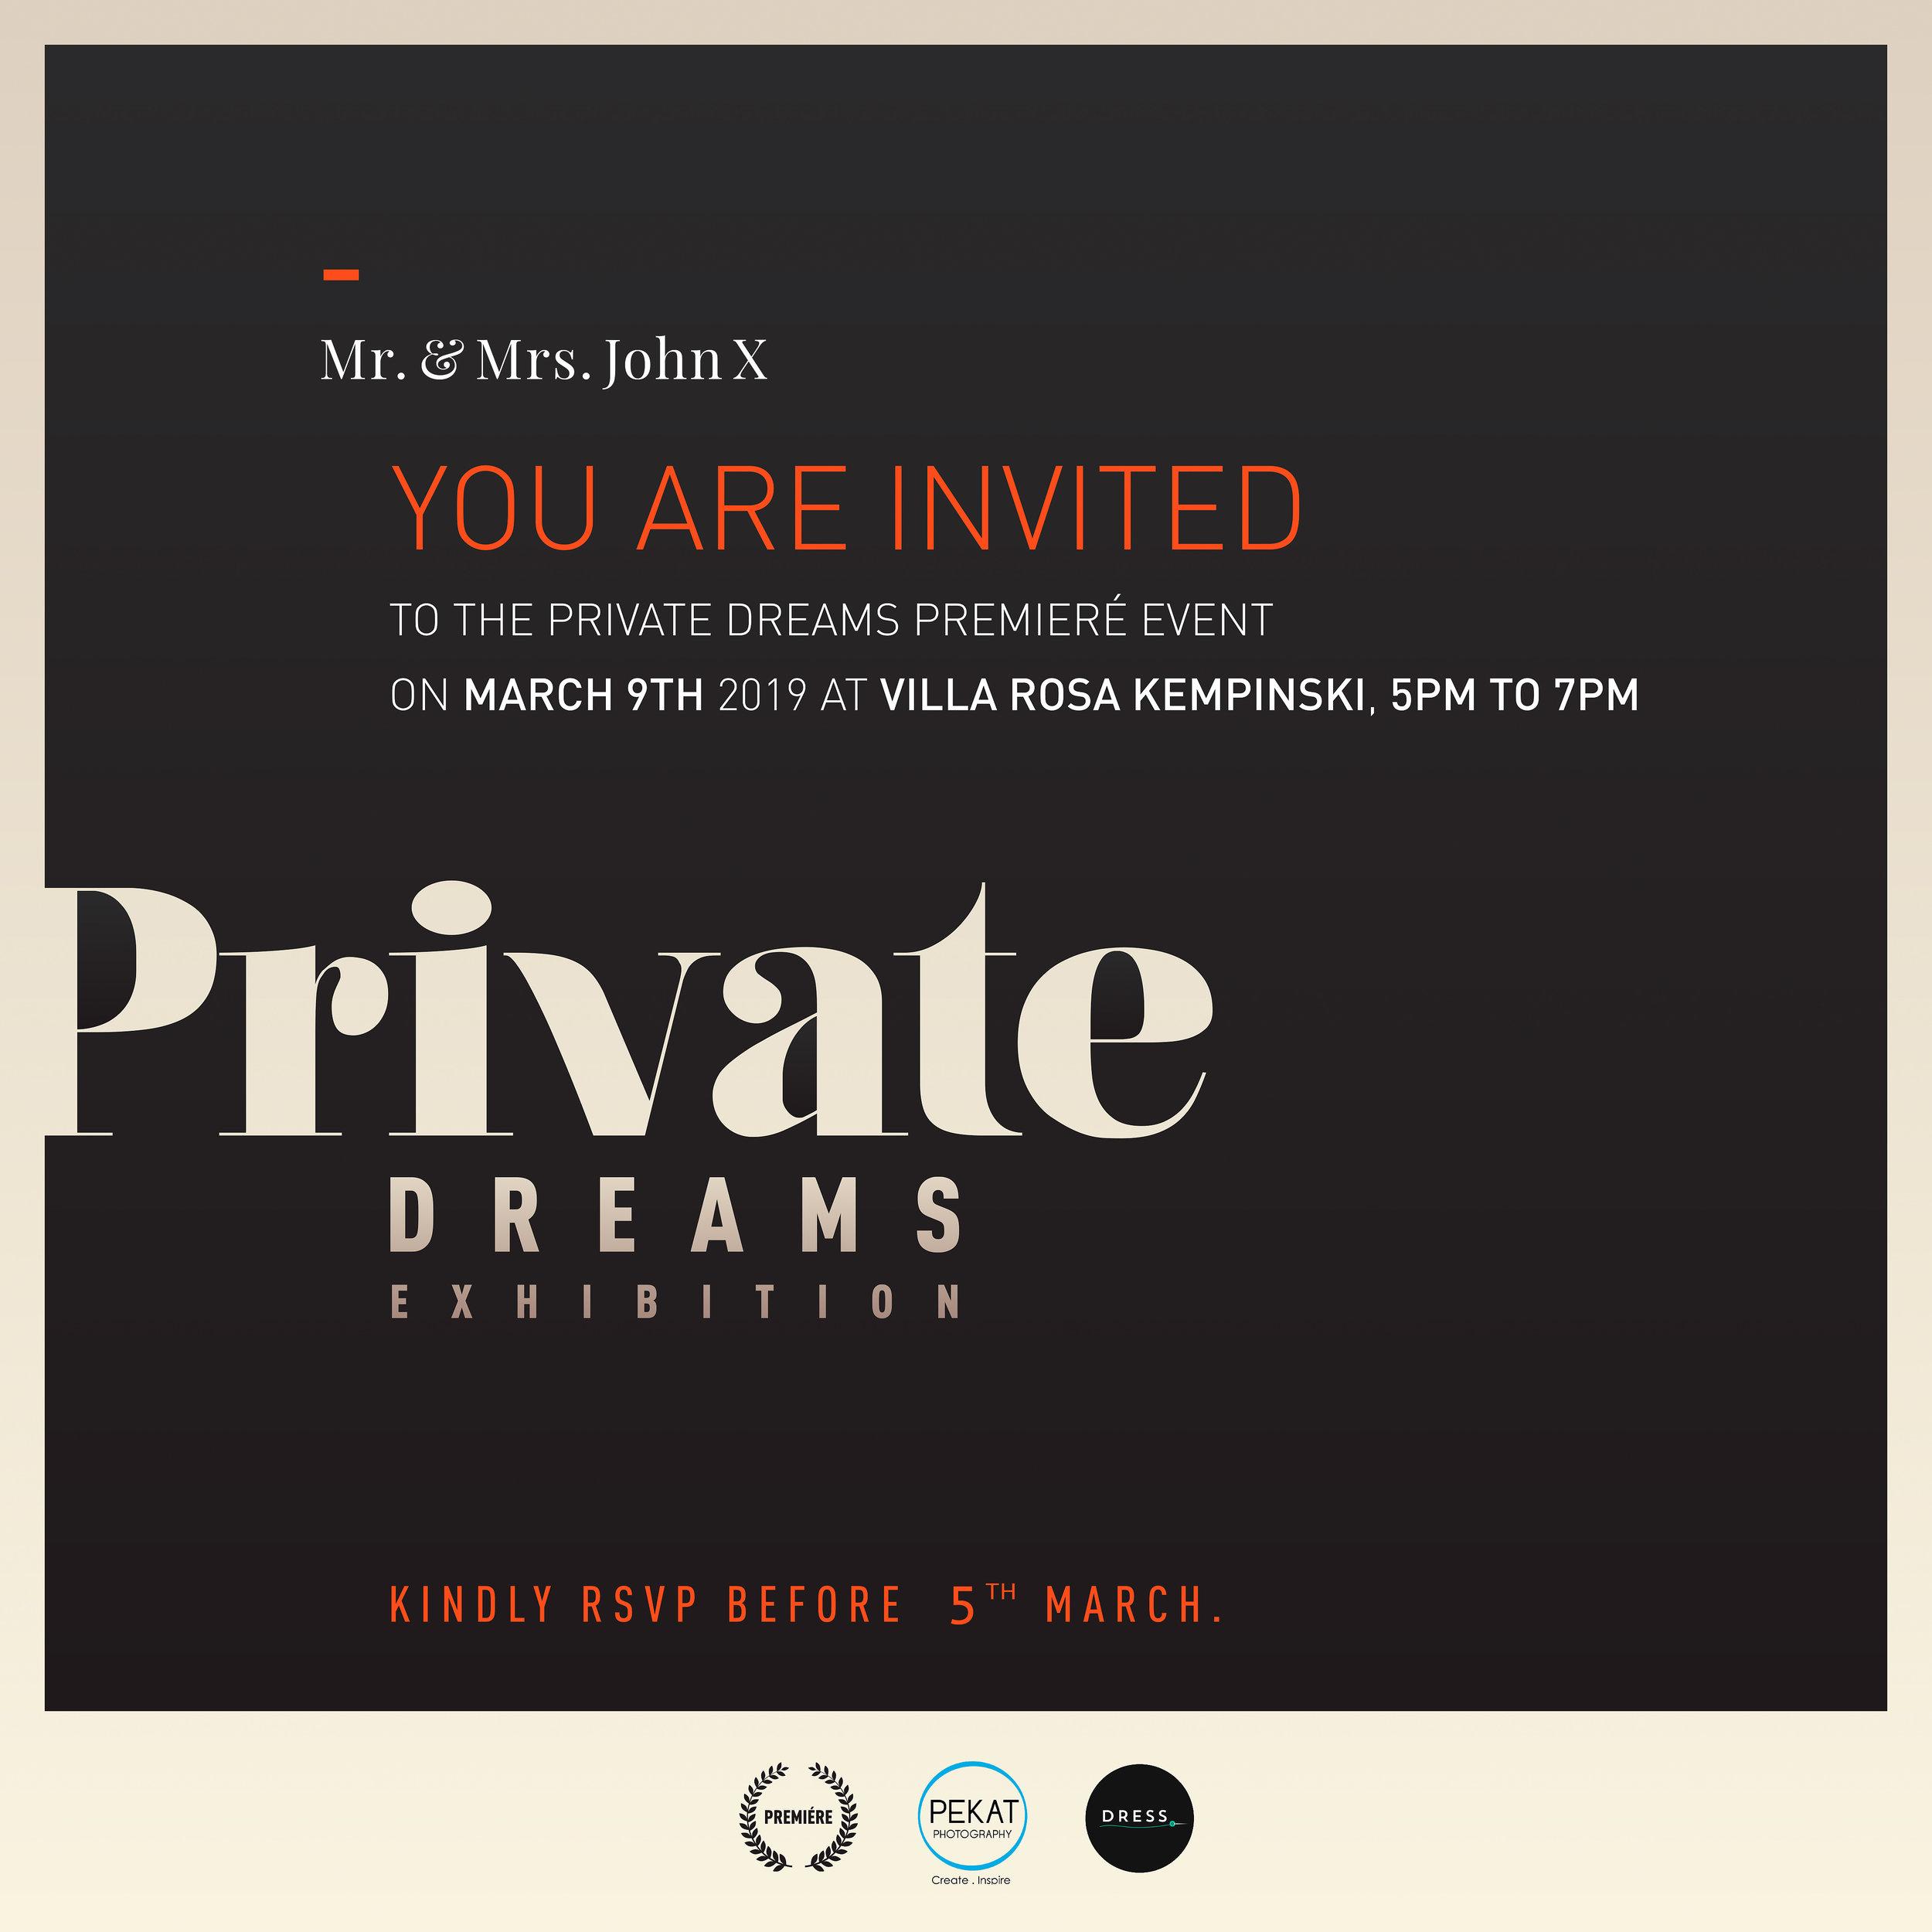 Invitation r4